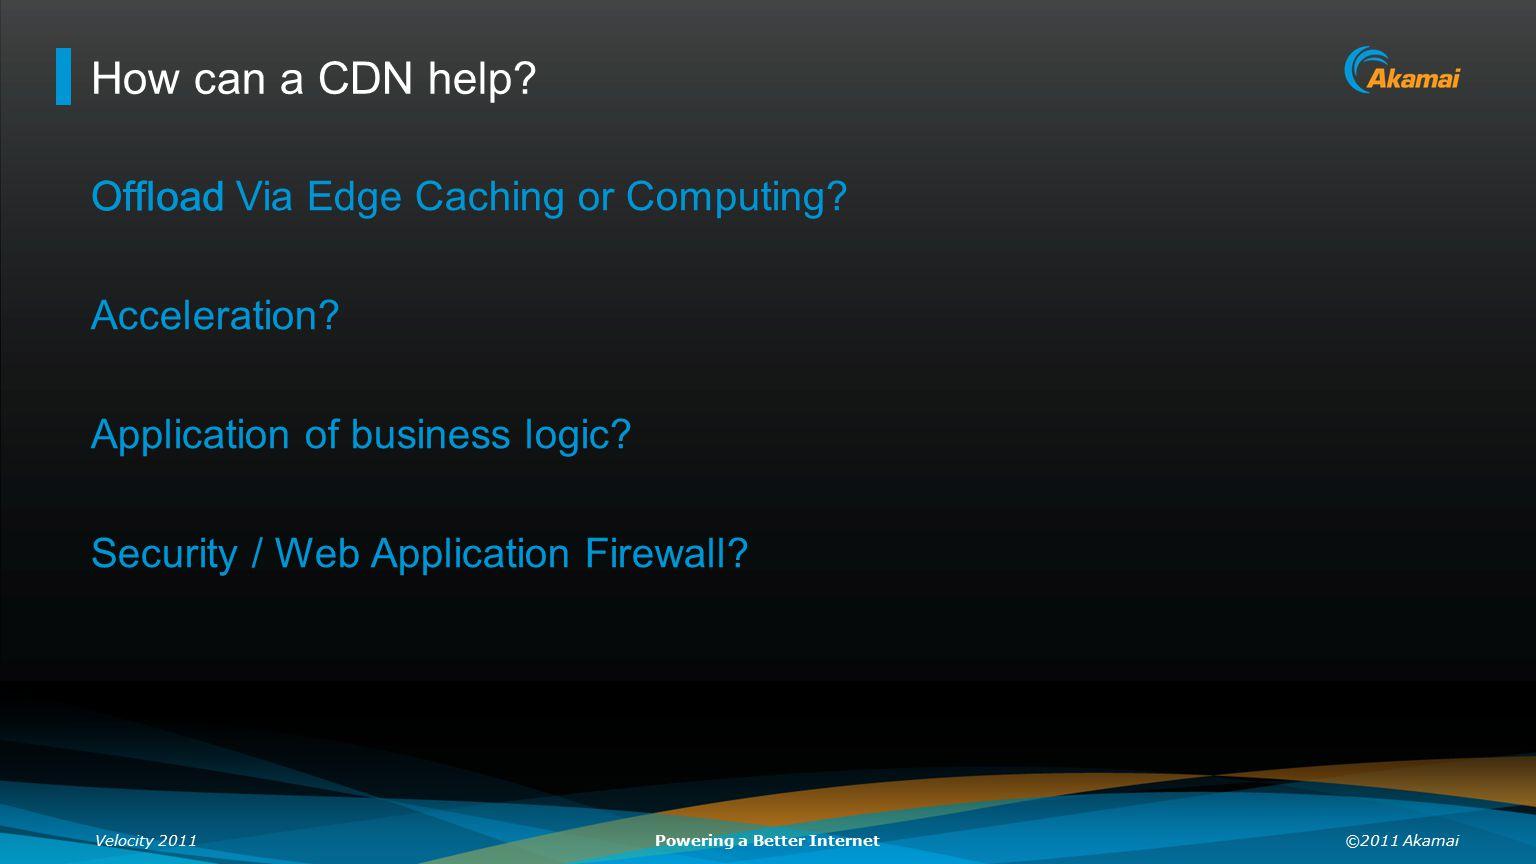 How can a CDN help Offload